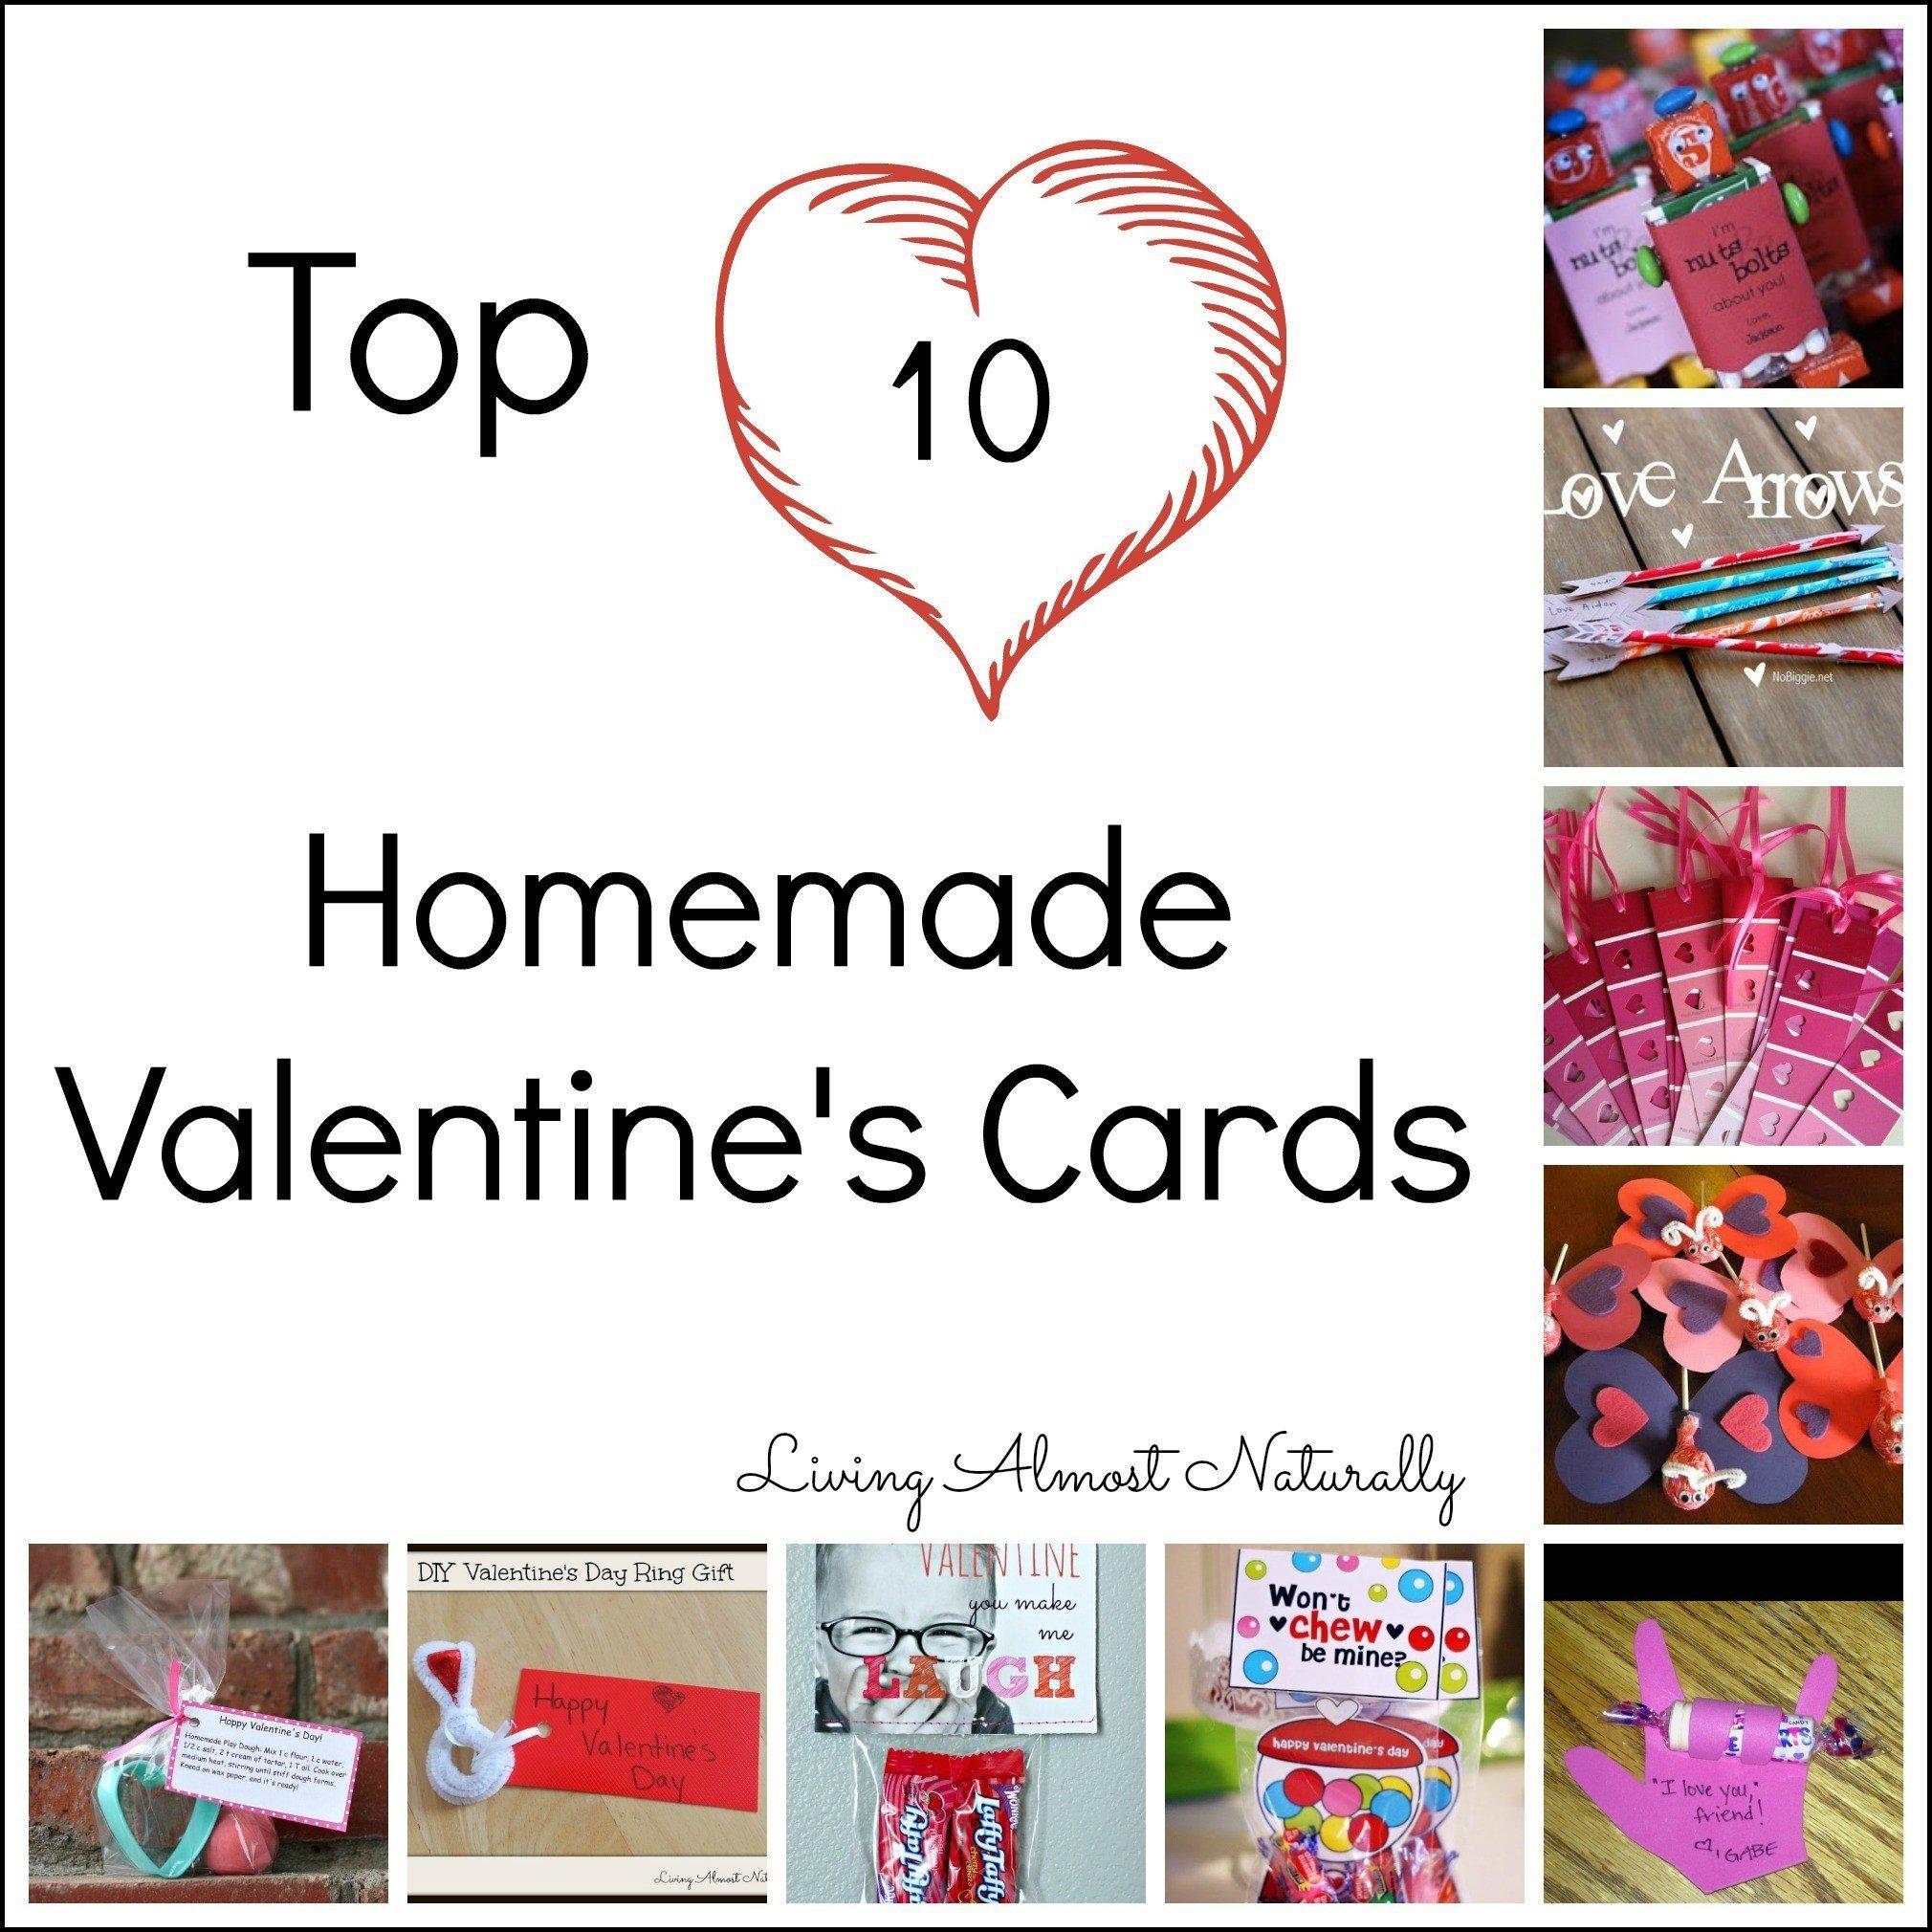 Imágenes de Homemade Valentine Card Ideas For Boyfriend